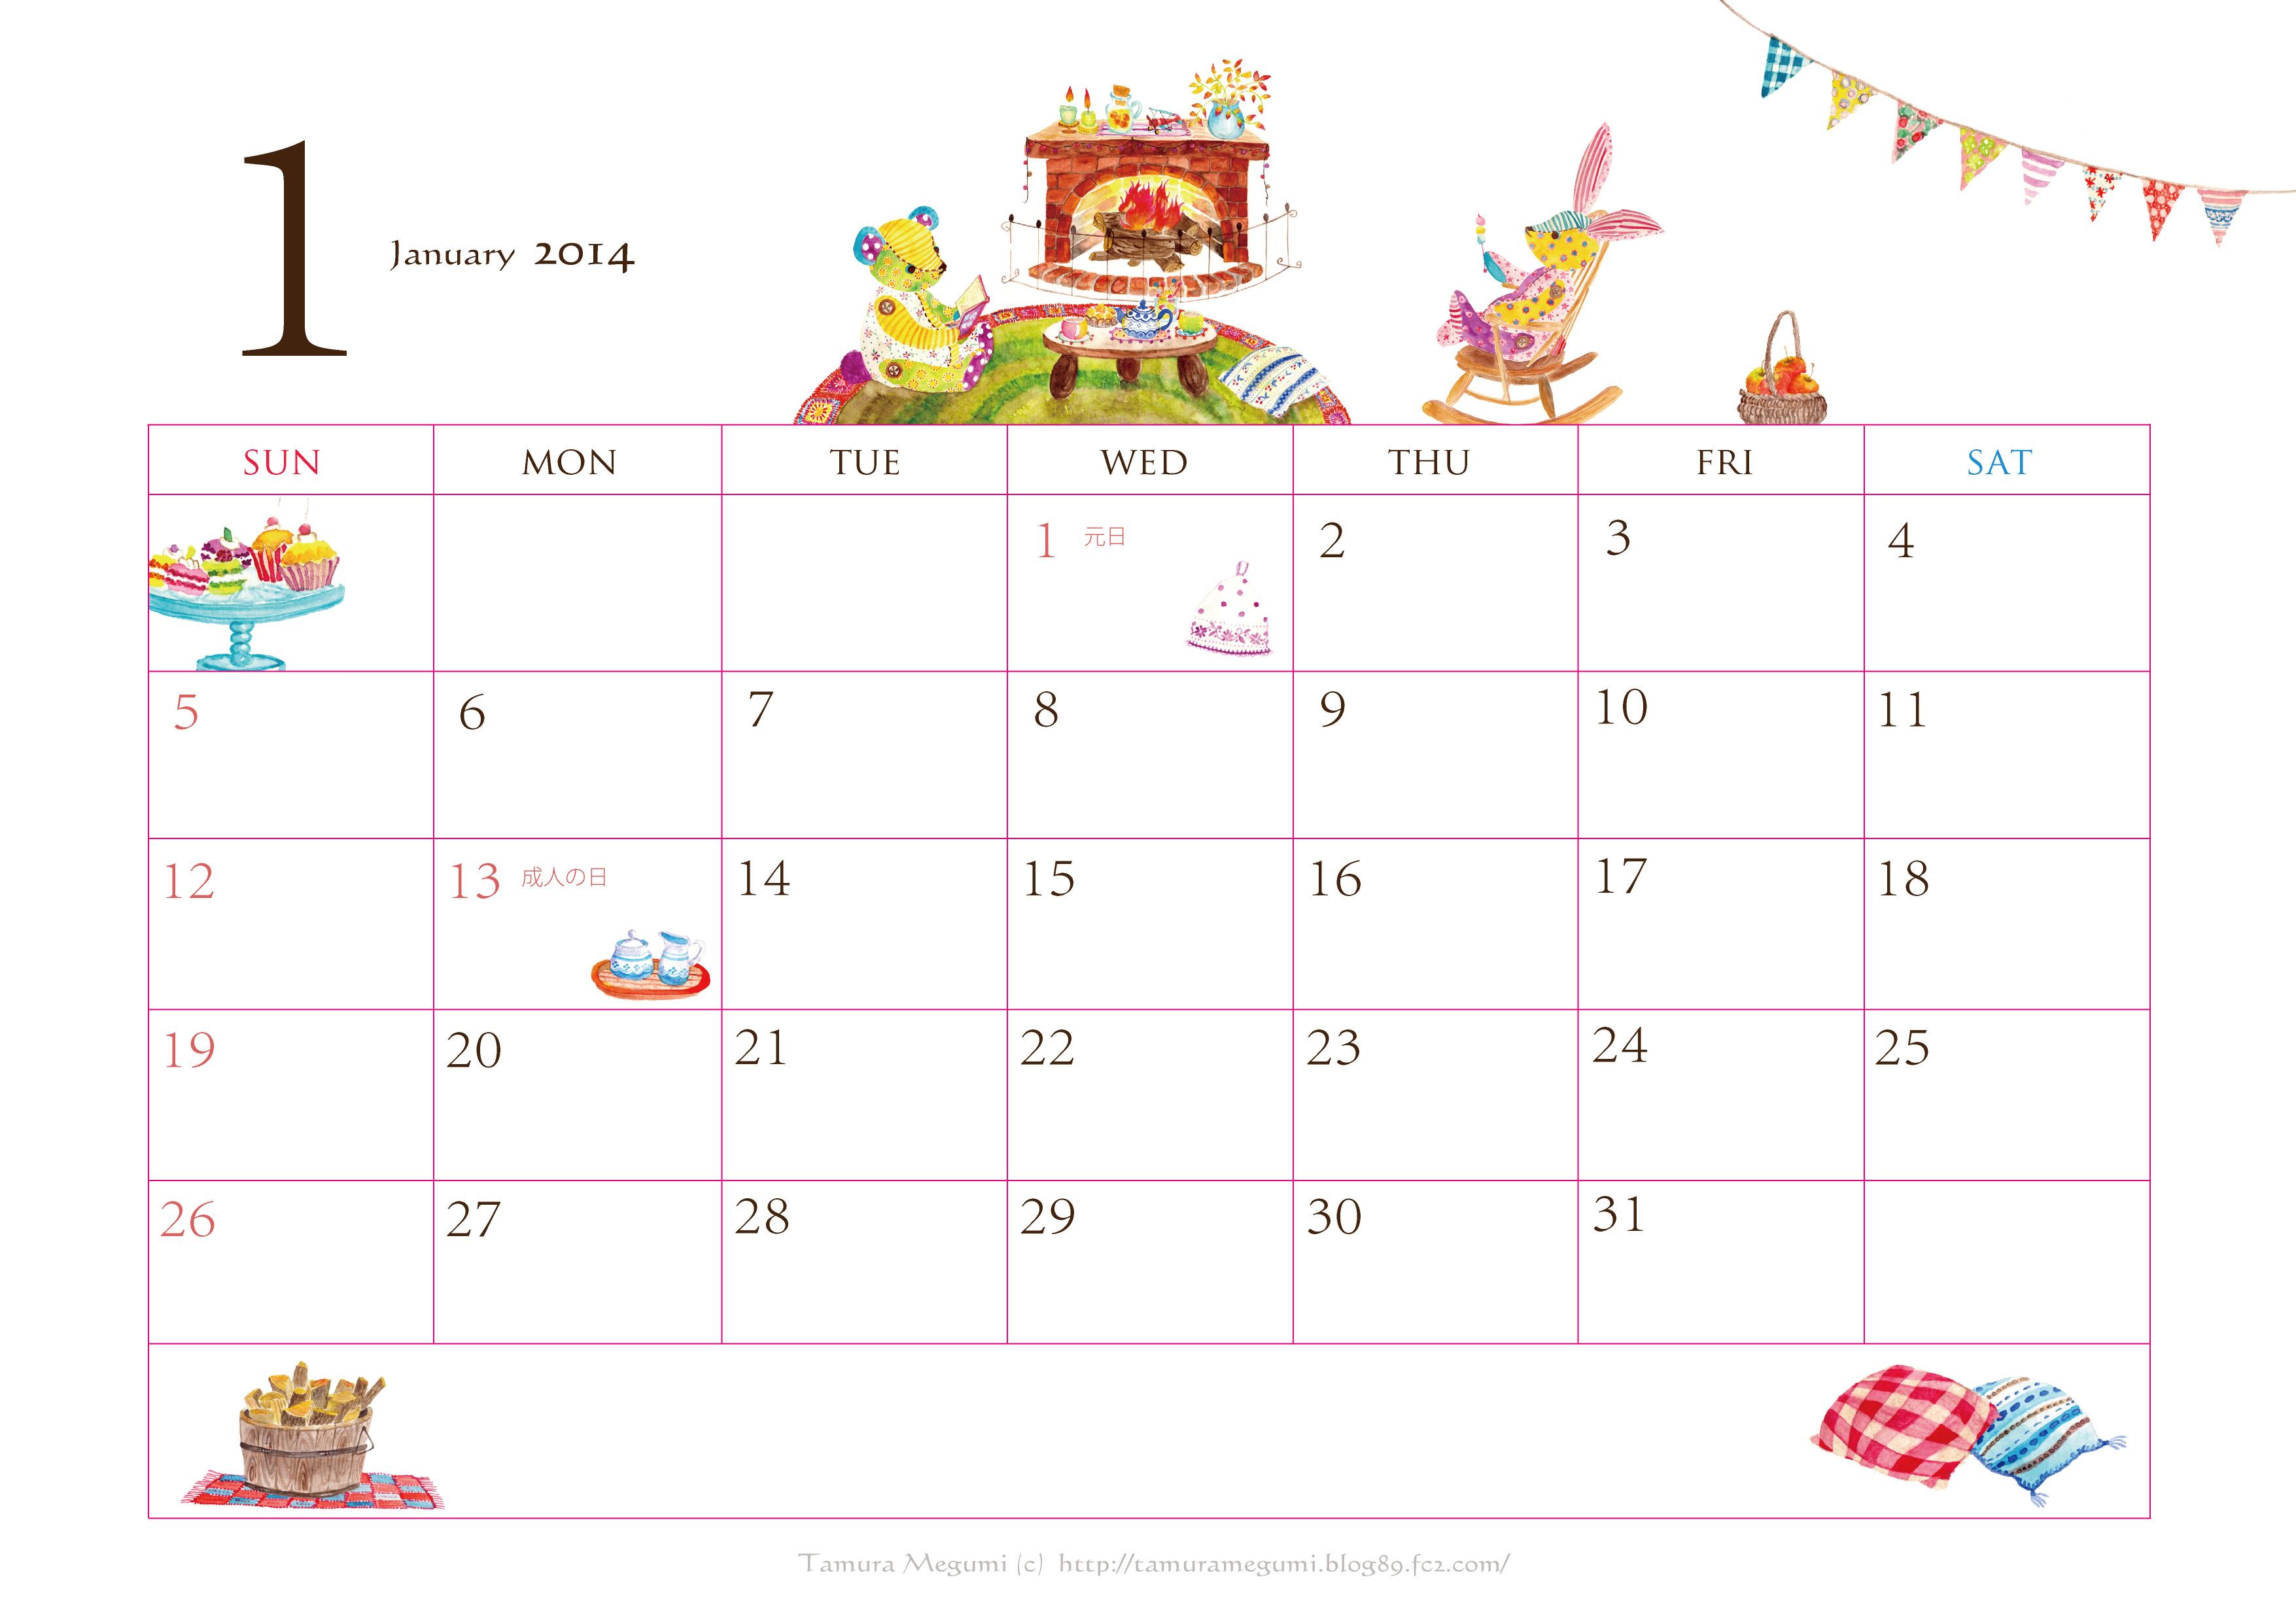 カレンダー a4 カレンダー 2014 : カレンダーA4ヨコ2014-01